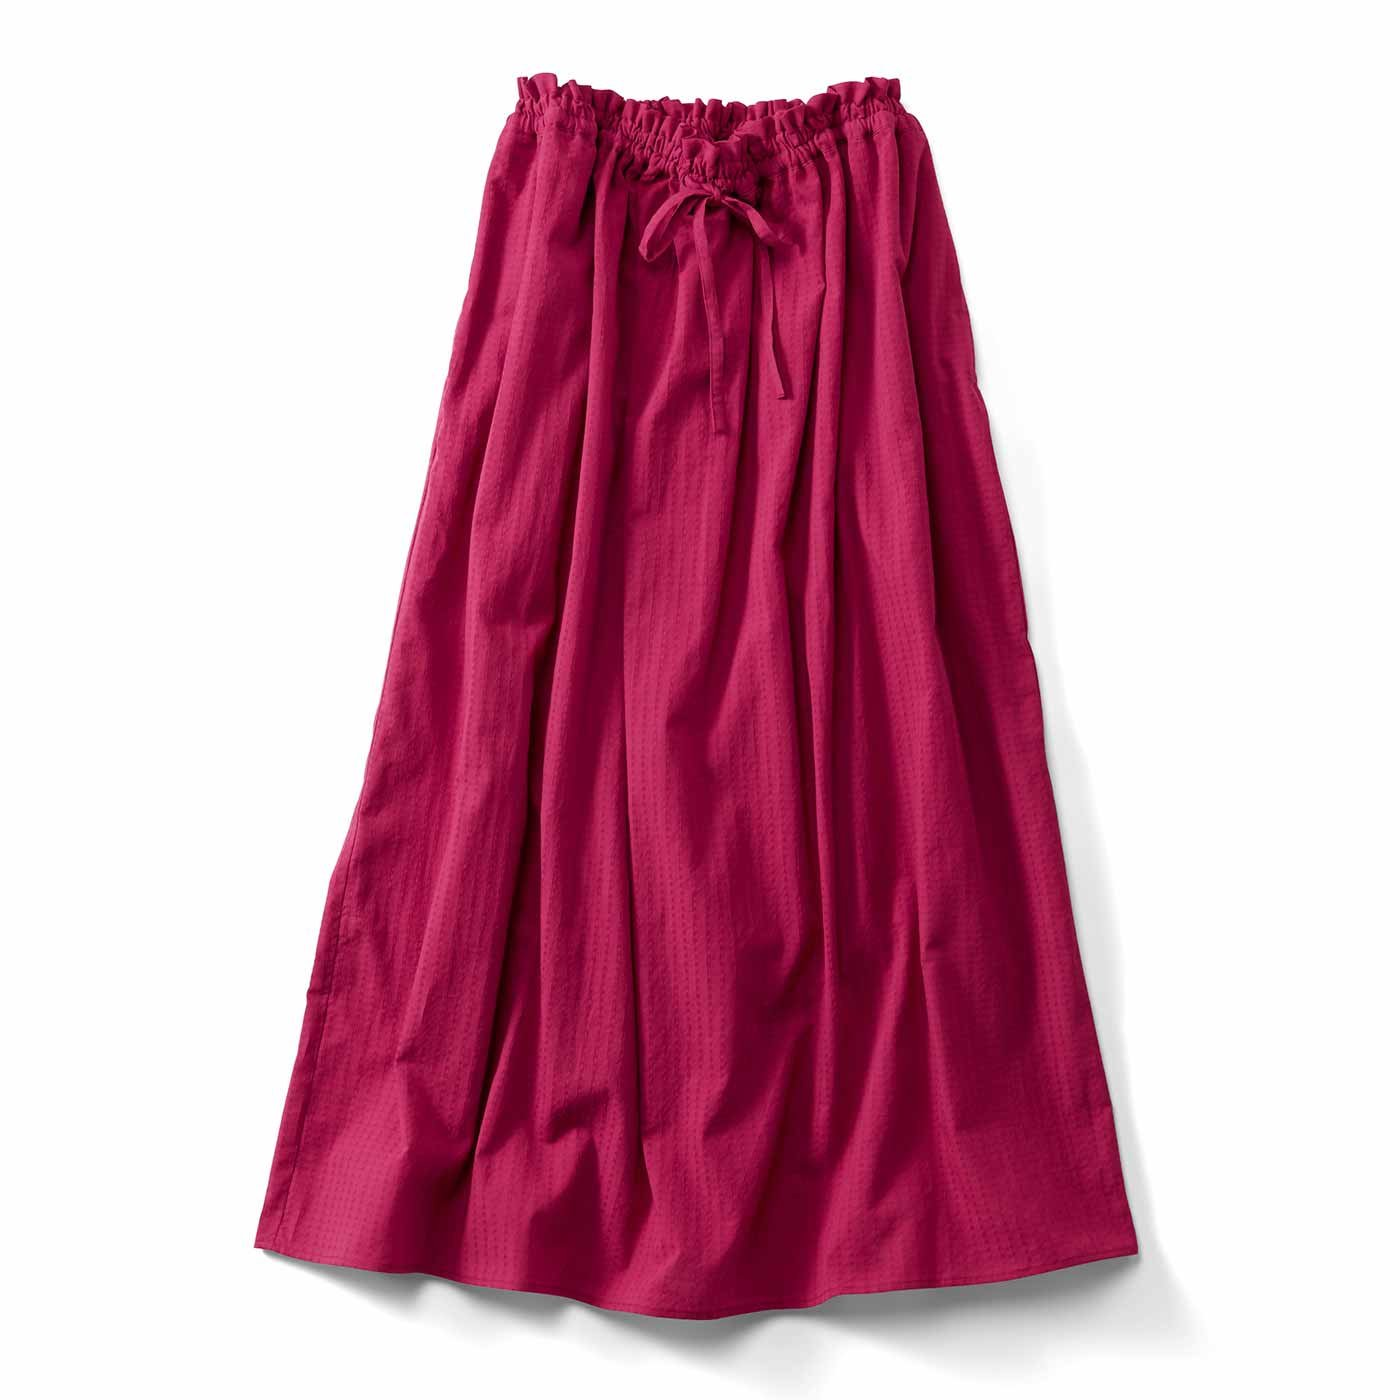 THREE FIFTY STANDARD 赤のドビーストライプギャザースカート